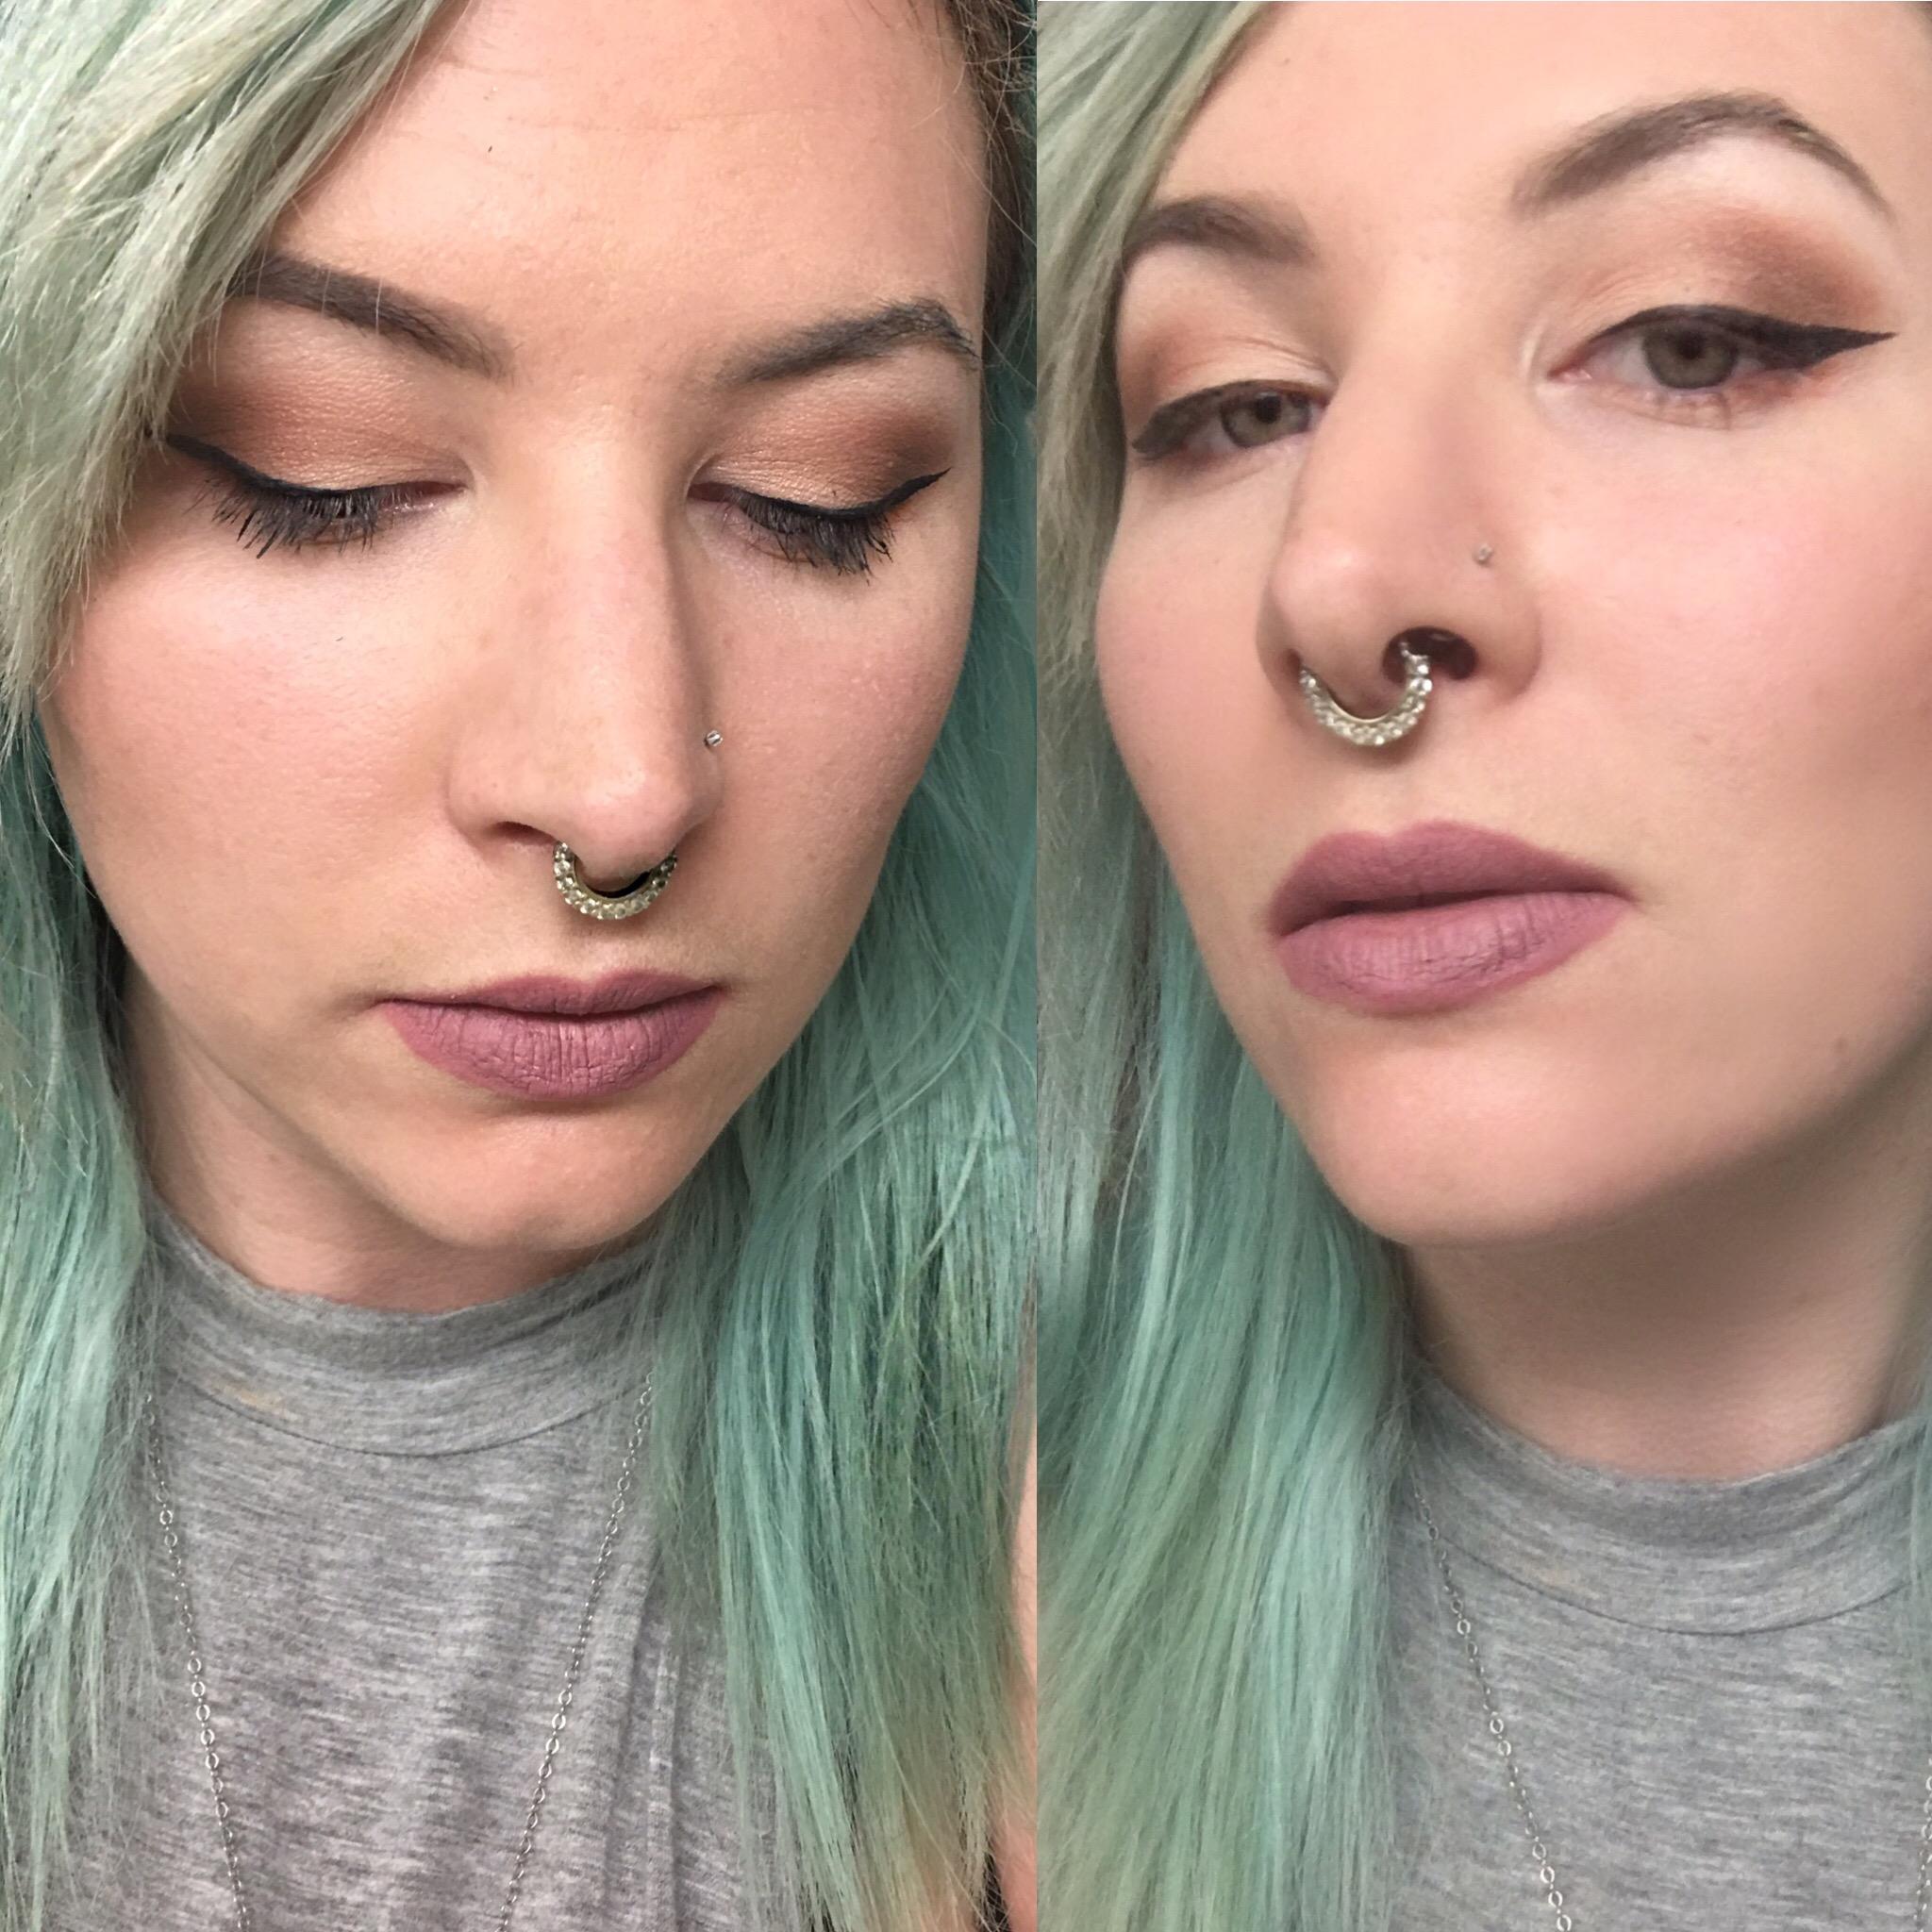 More of a grey look with Stila Baci liquid lipstick